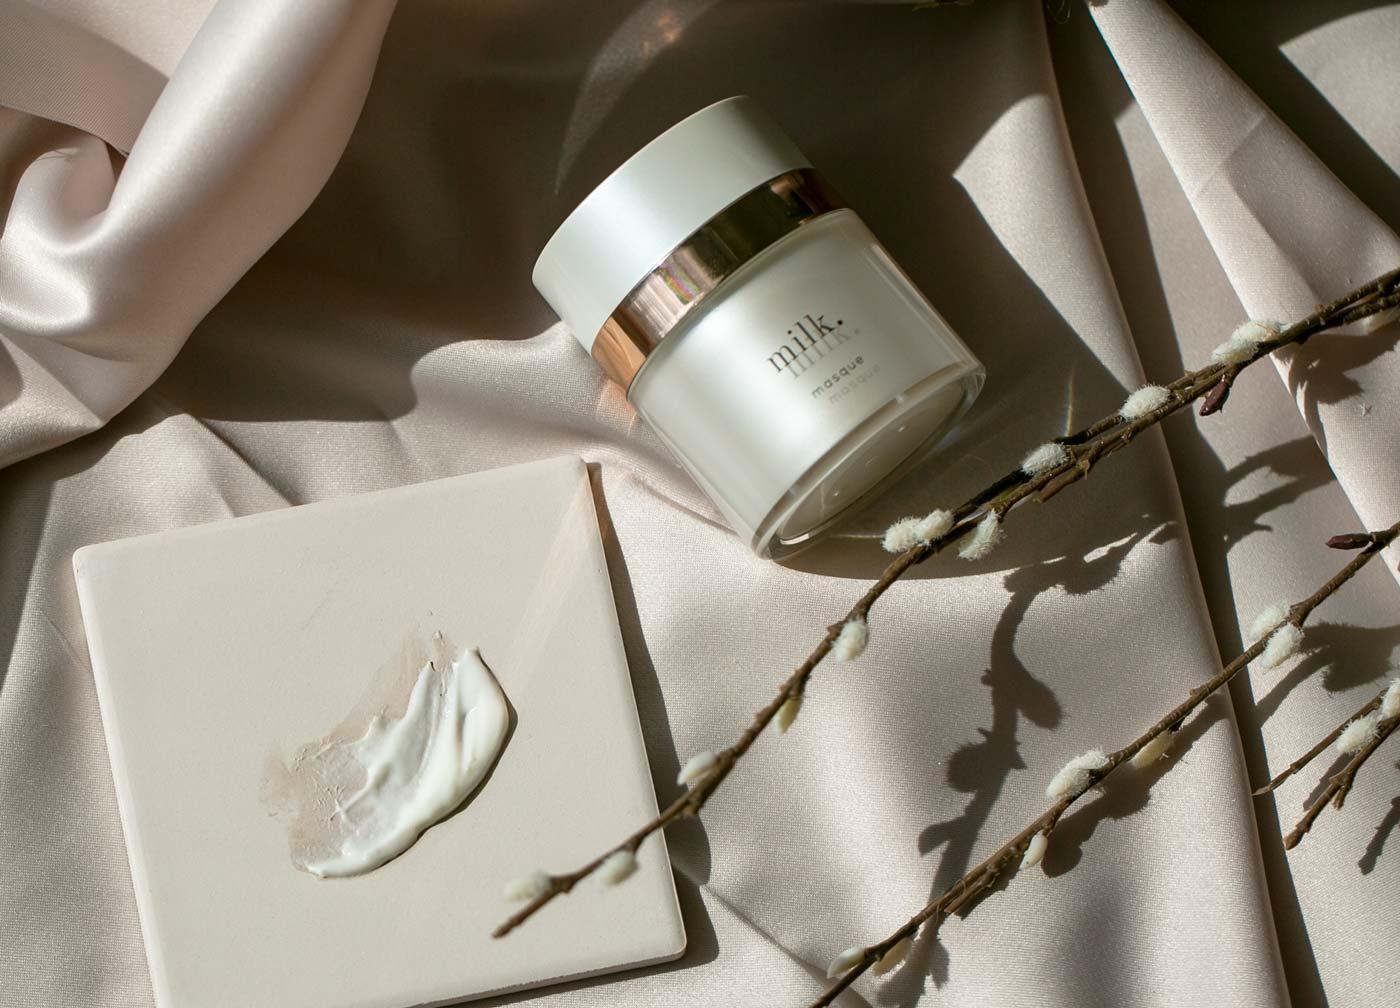 Maskcara skincare products